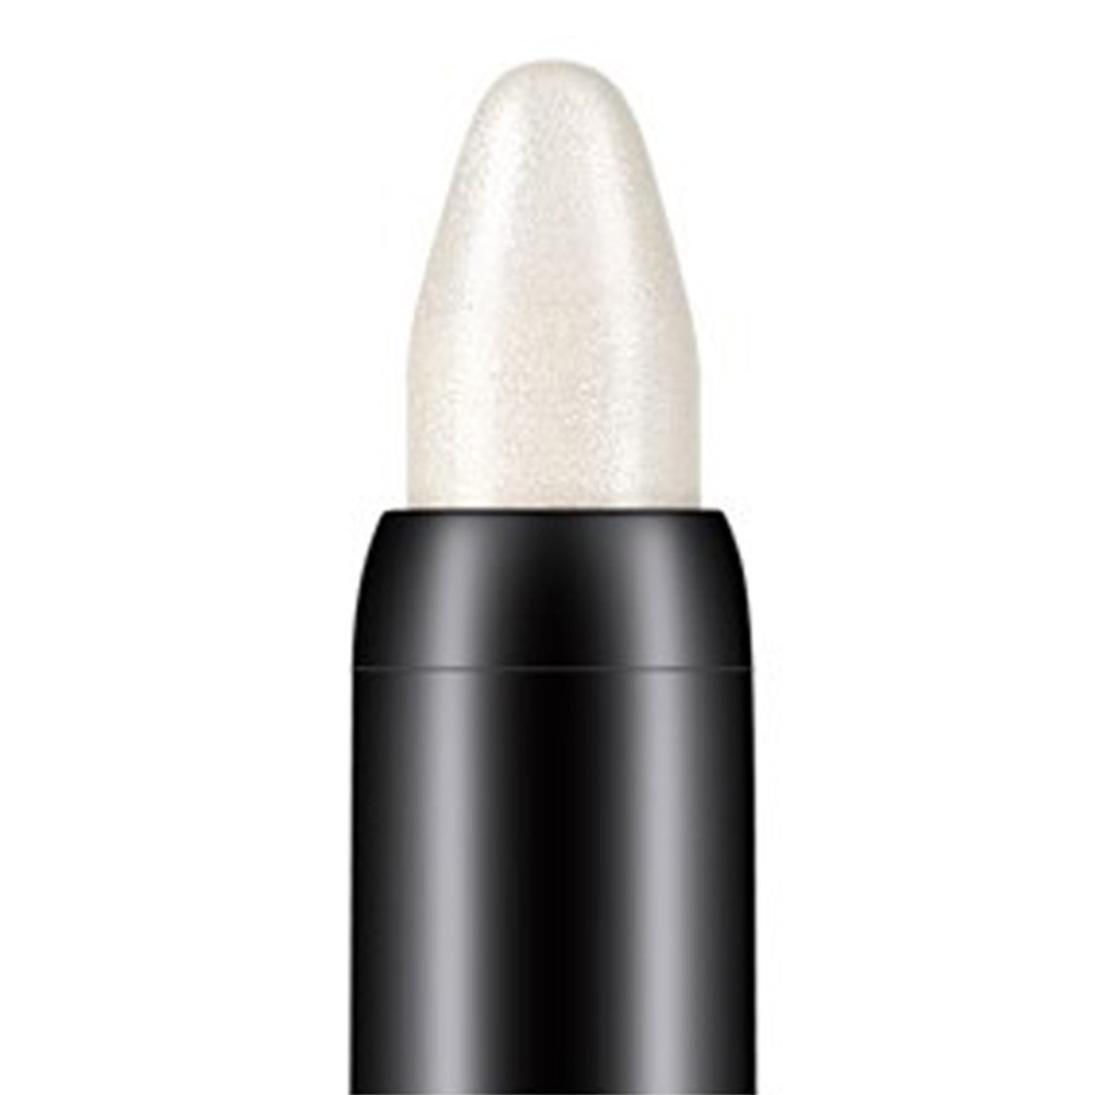 Oksale® Beauty Highlighter Eyeshadow Pencil 116mm Eyeshadow Pencil High-Light Pen (White)